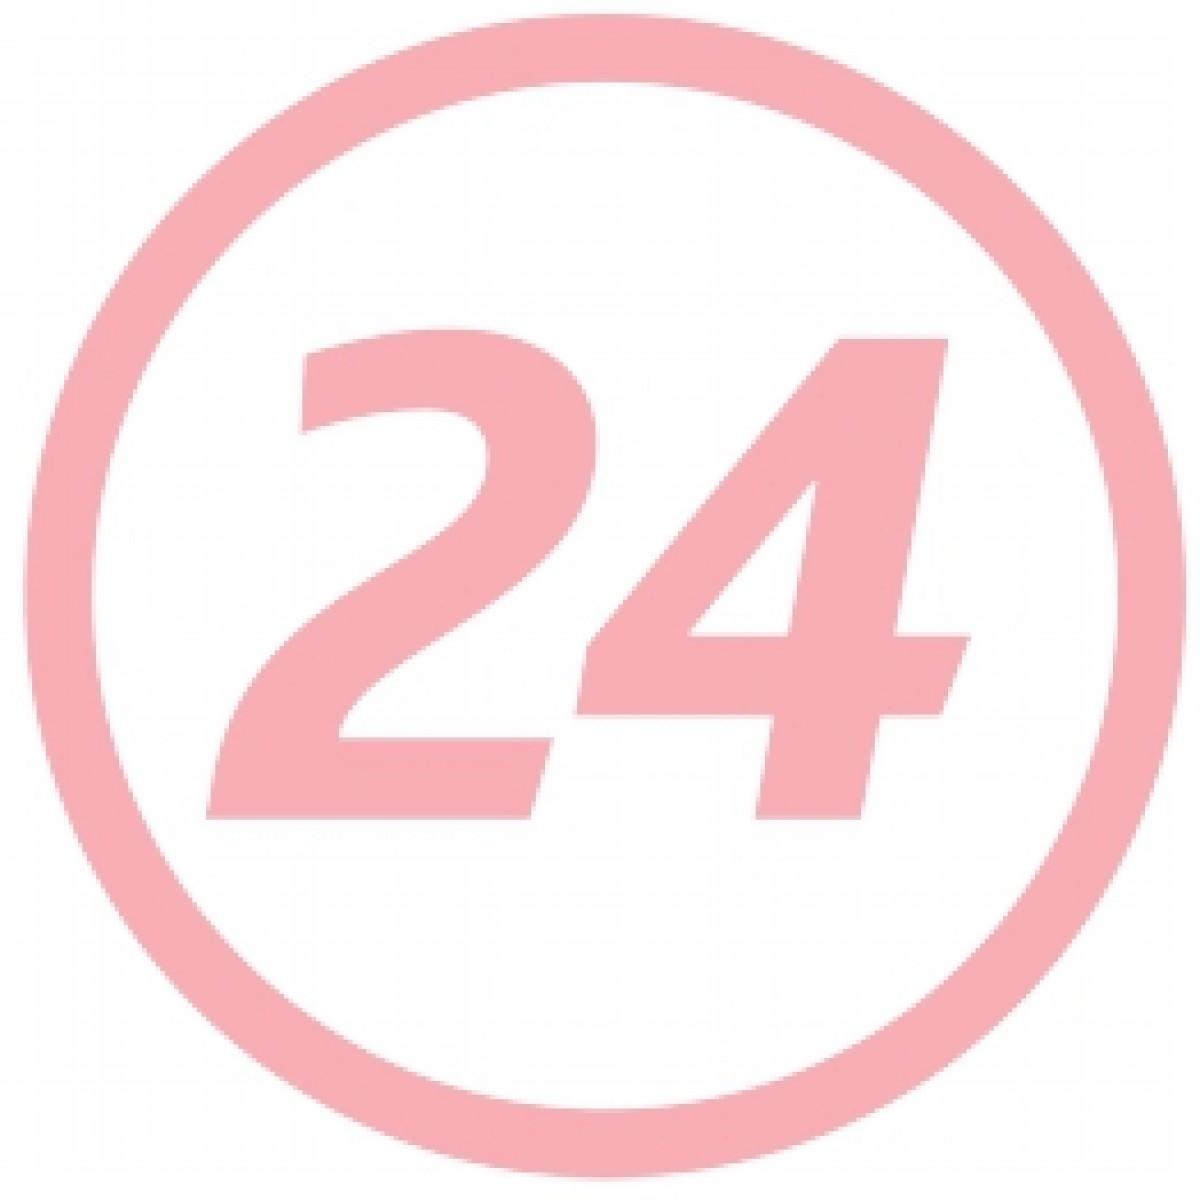 Balansoar muzical 2 in 1 cu vibratii Baby Mix 212 049 Pink